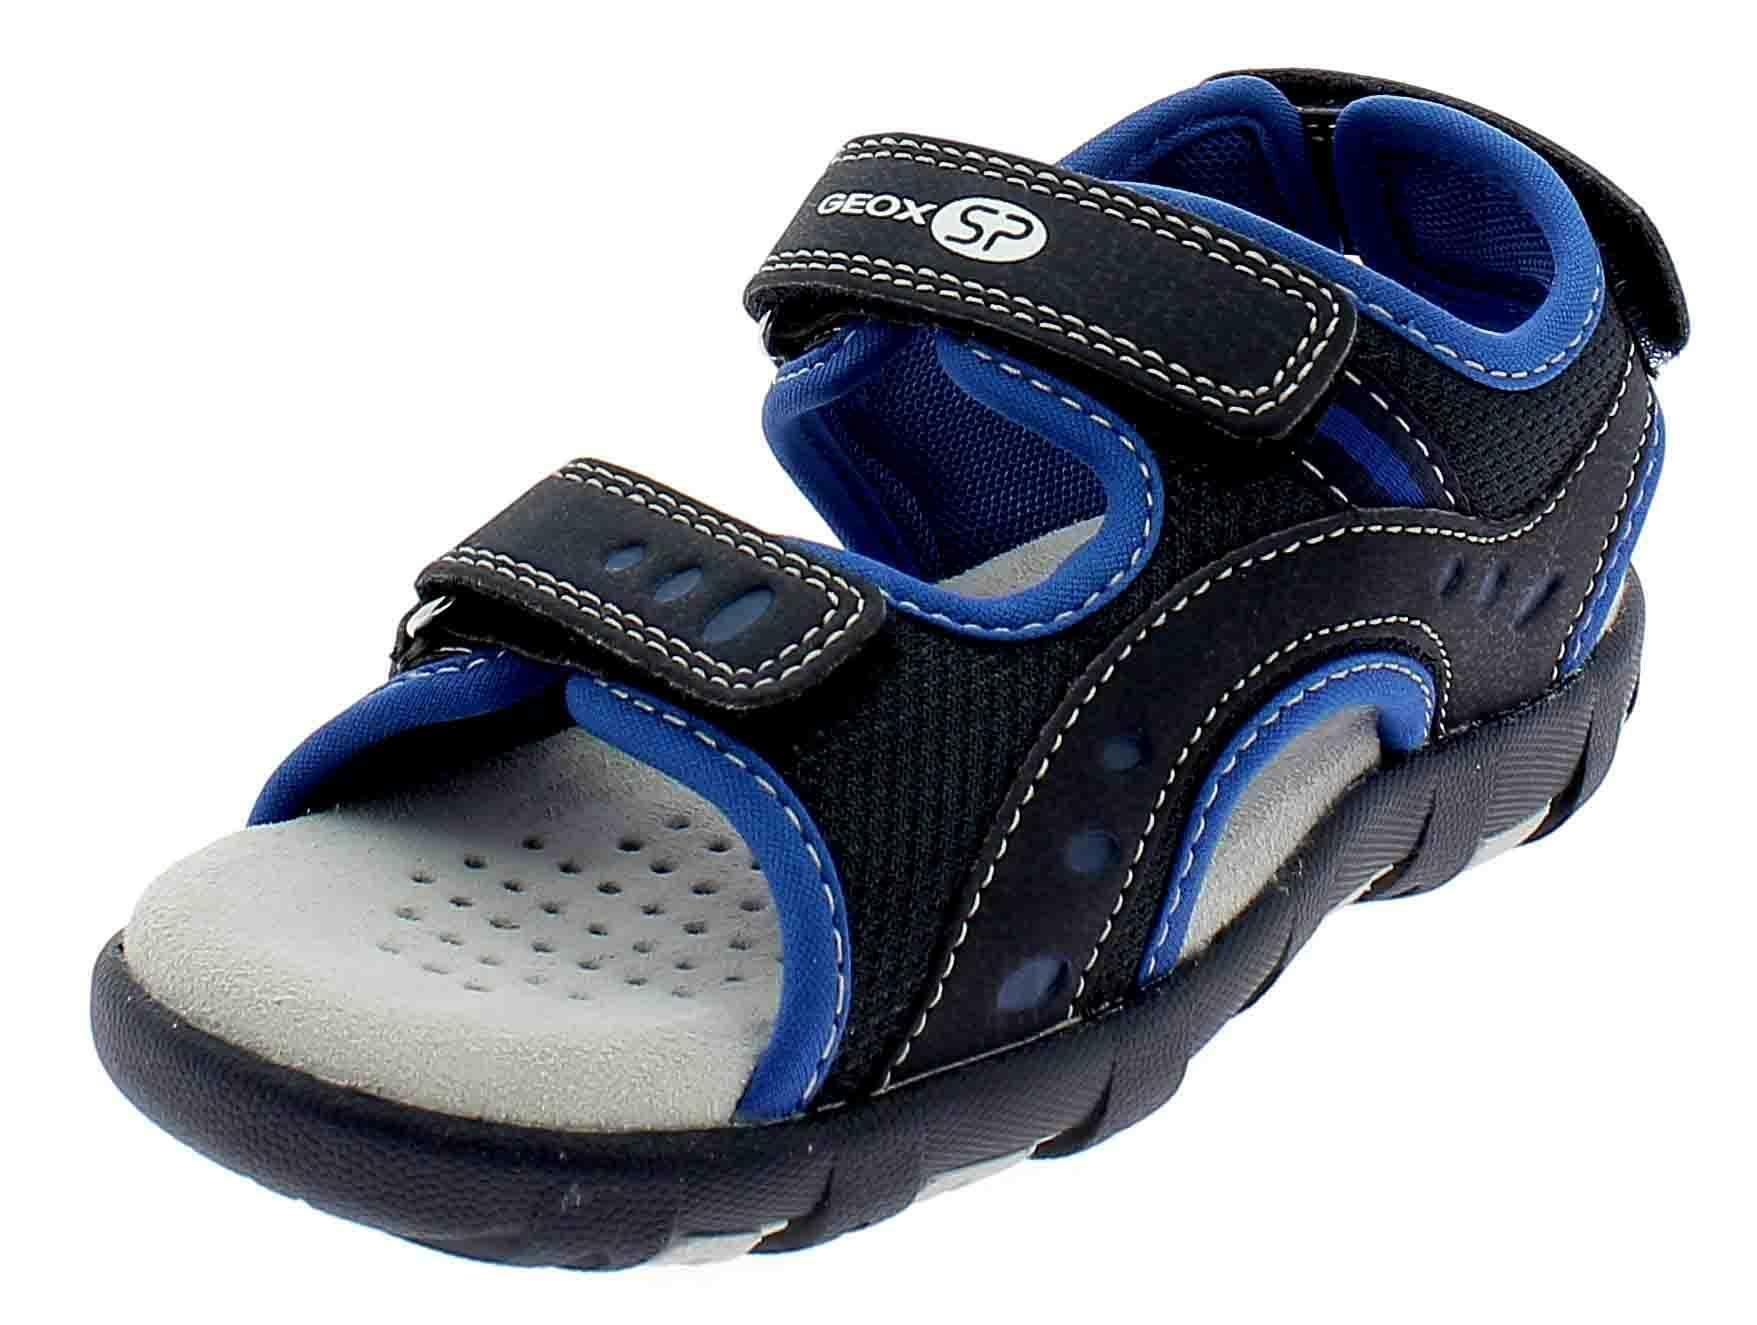 geox j pianeta sandaletti bambino blu j9264ac4226